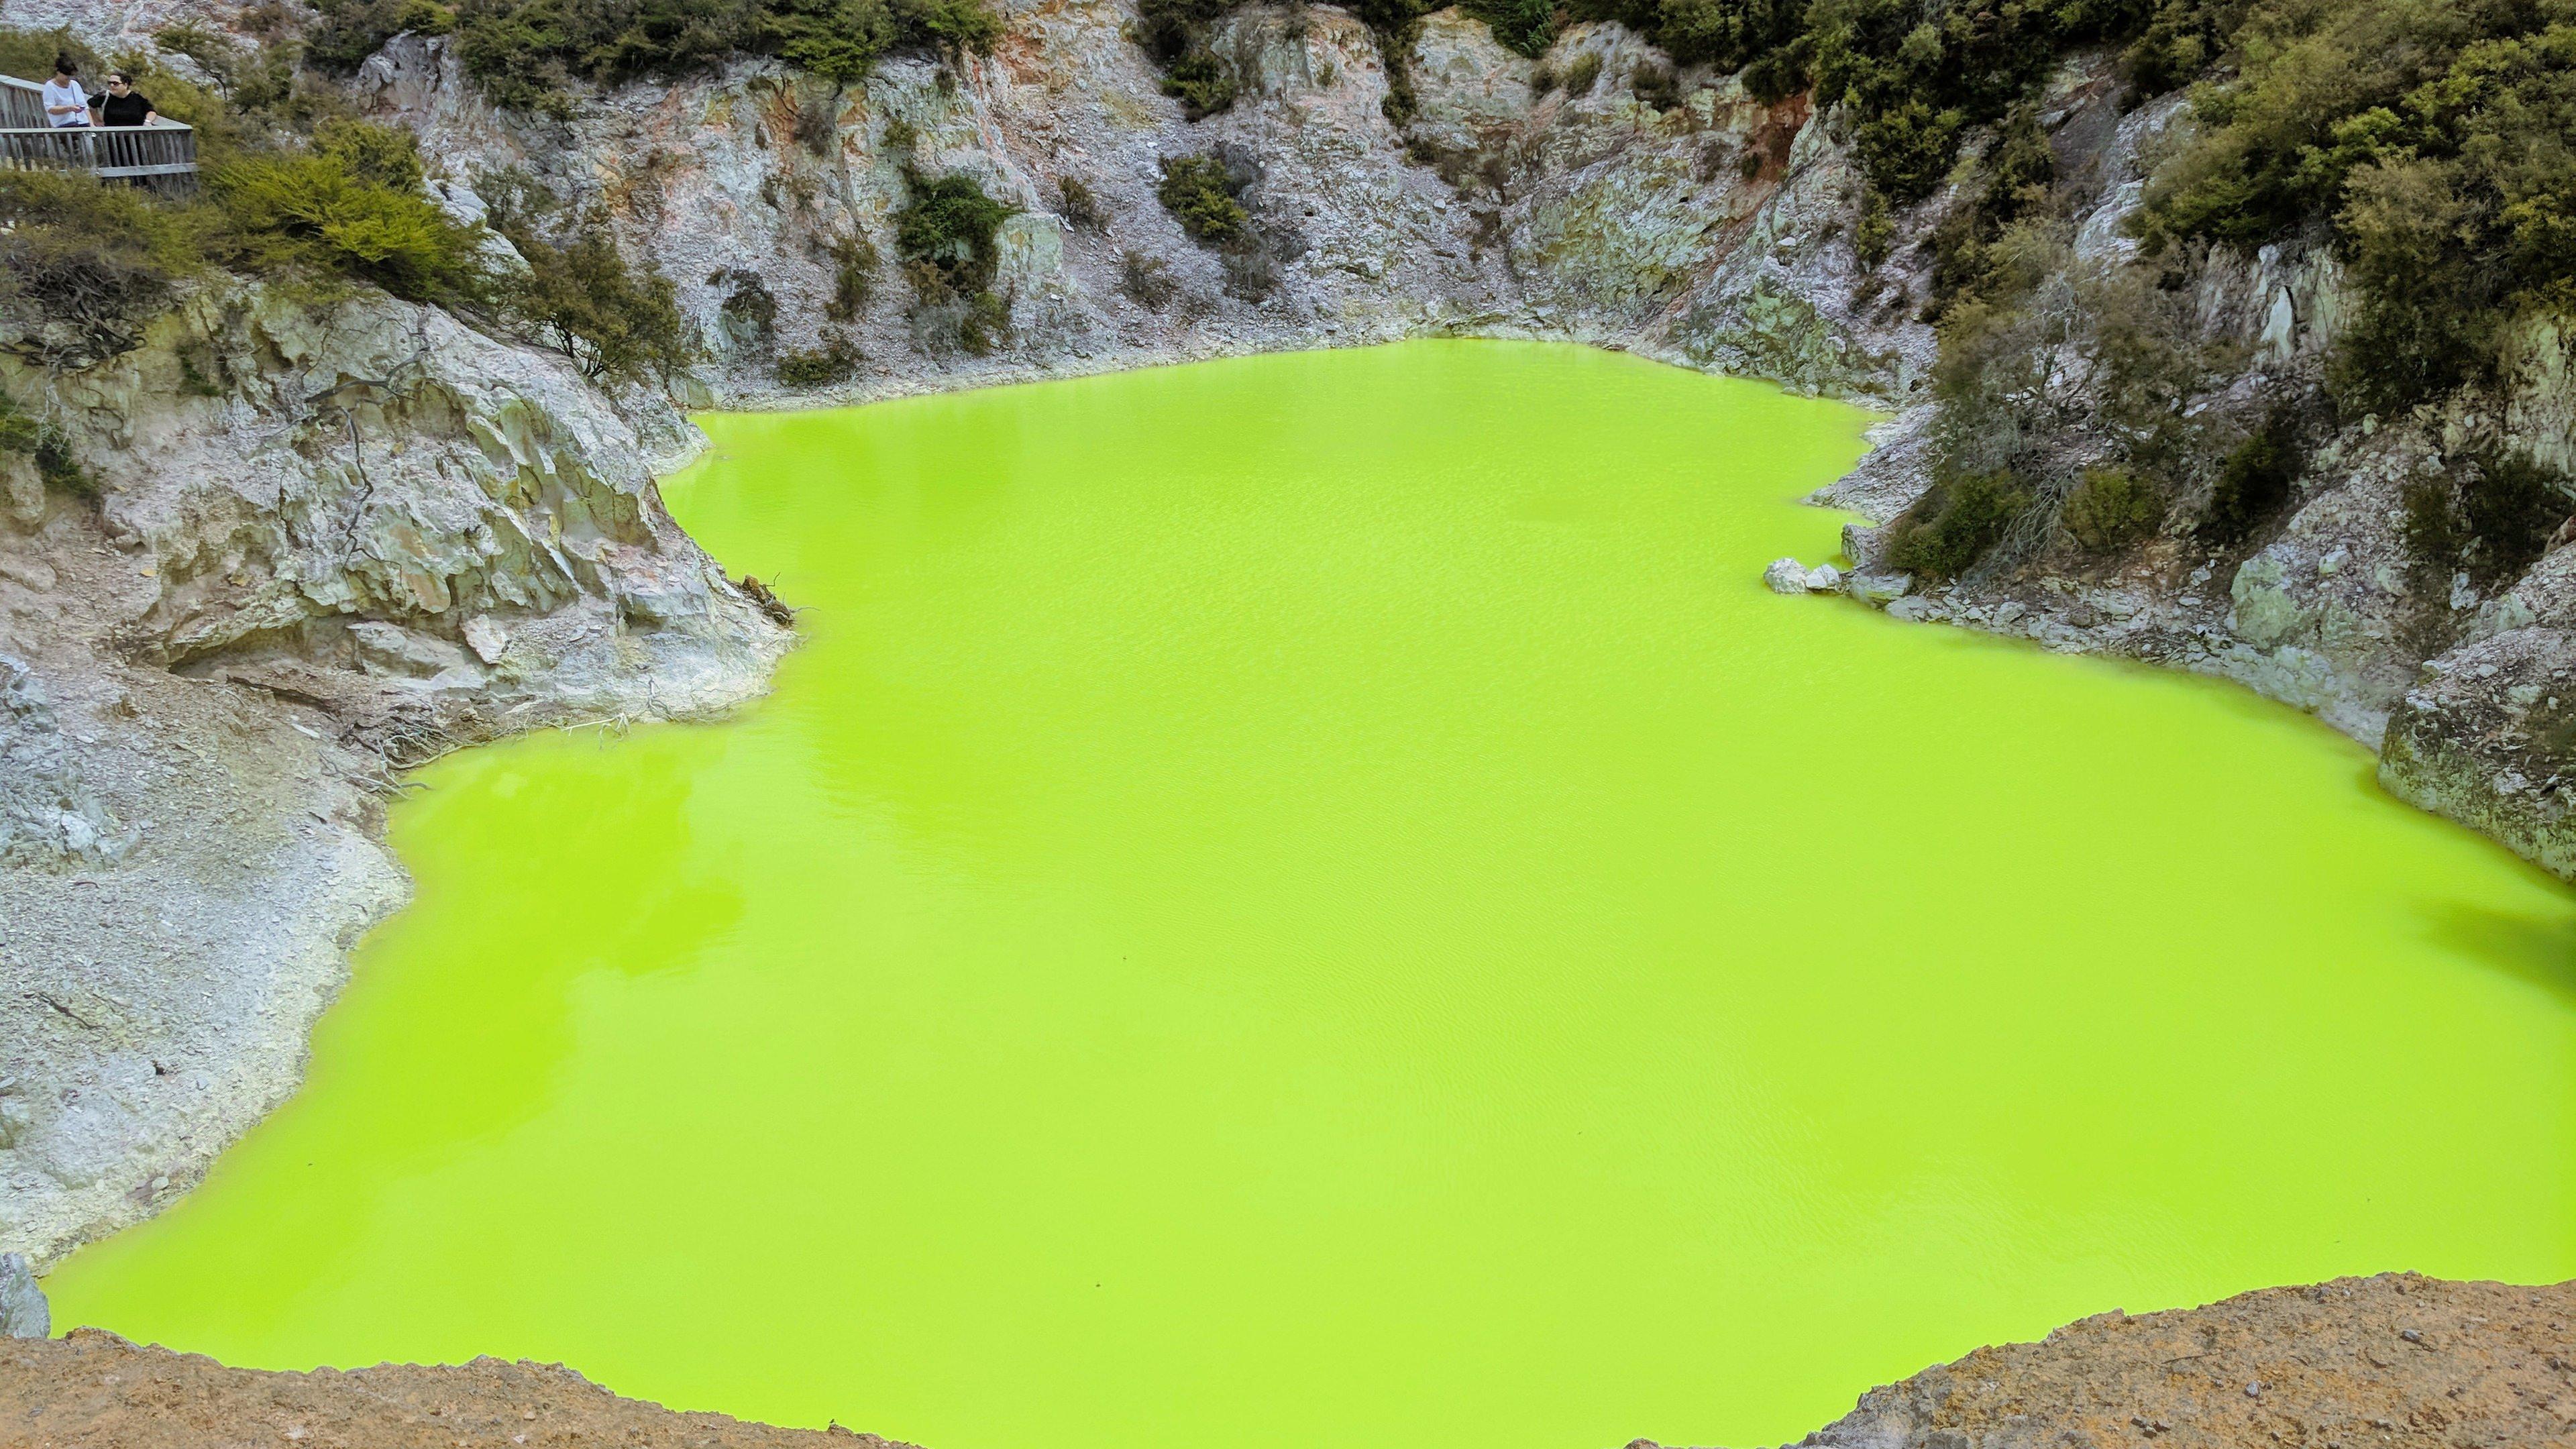 Wai O Tapu NZ Neon Green Water Caused by Sulfur 4K wallpaper 3840x2160